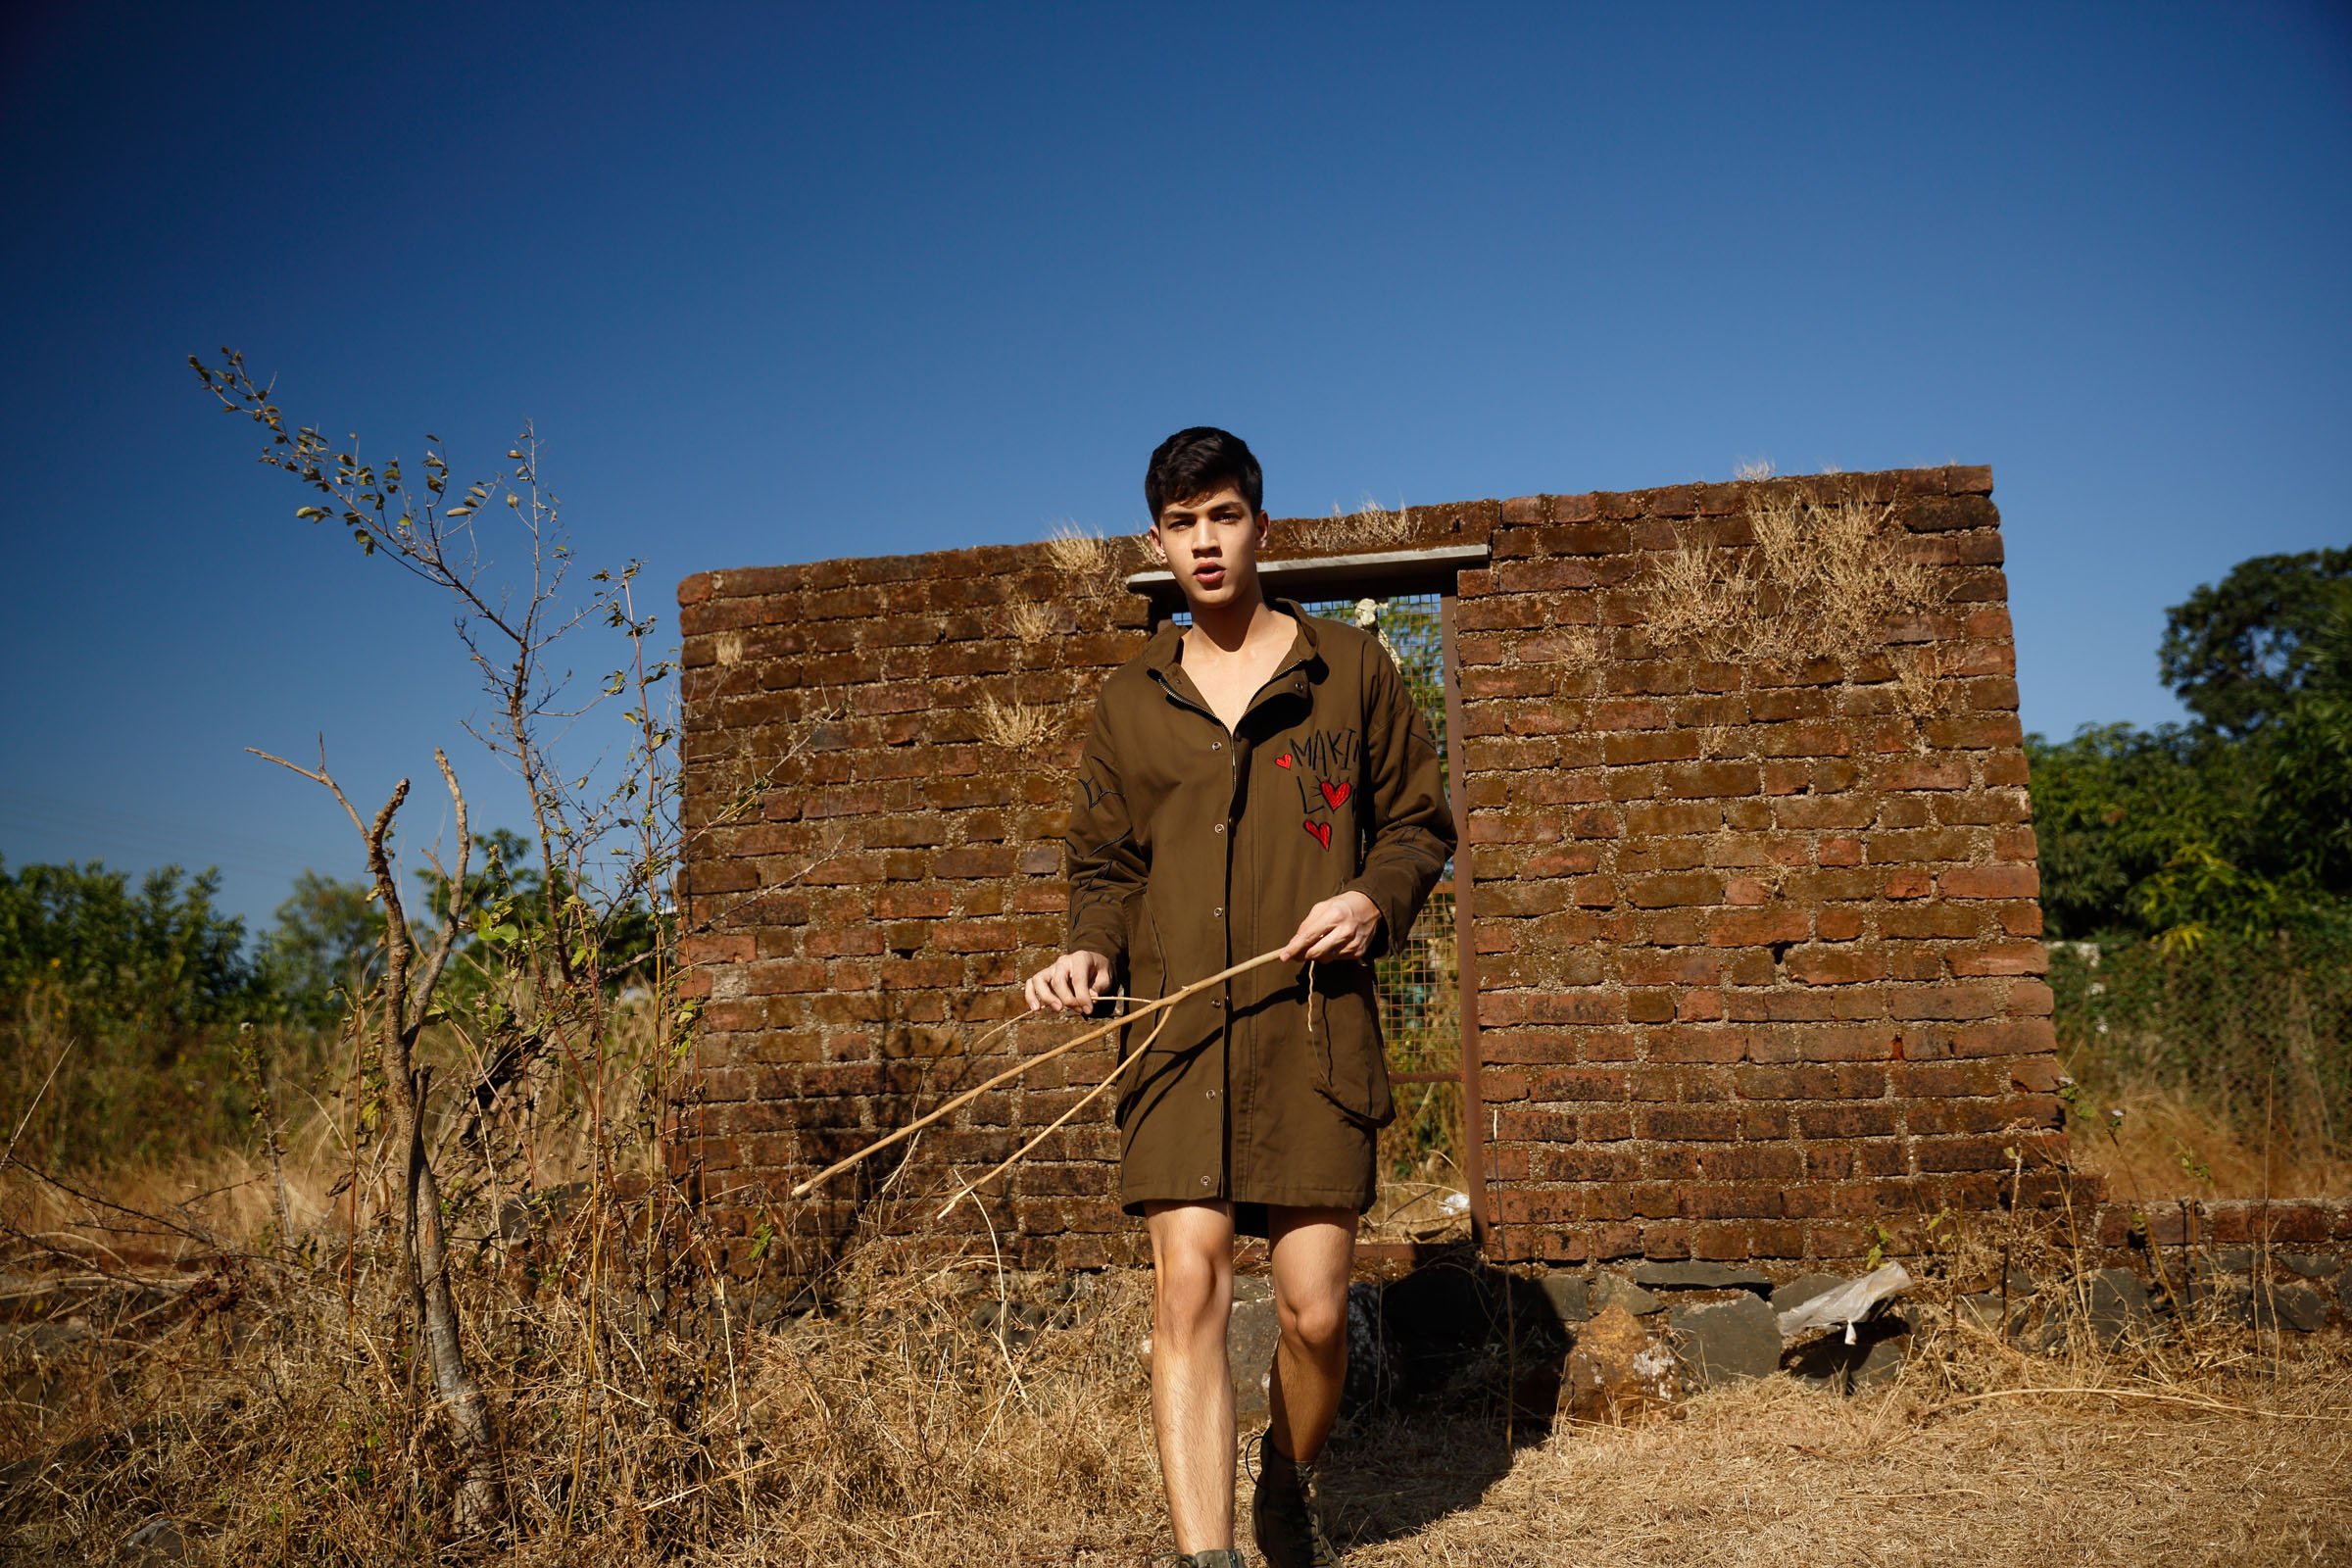 Kriator-Photographer-Country Roads_02.jpg